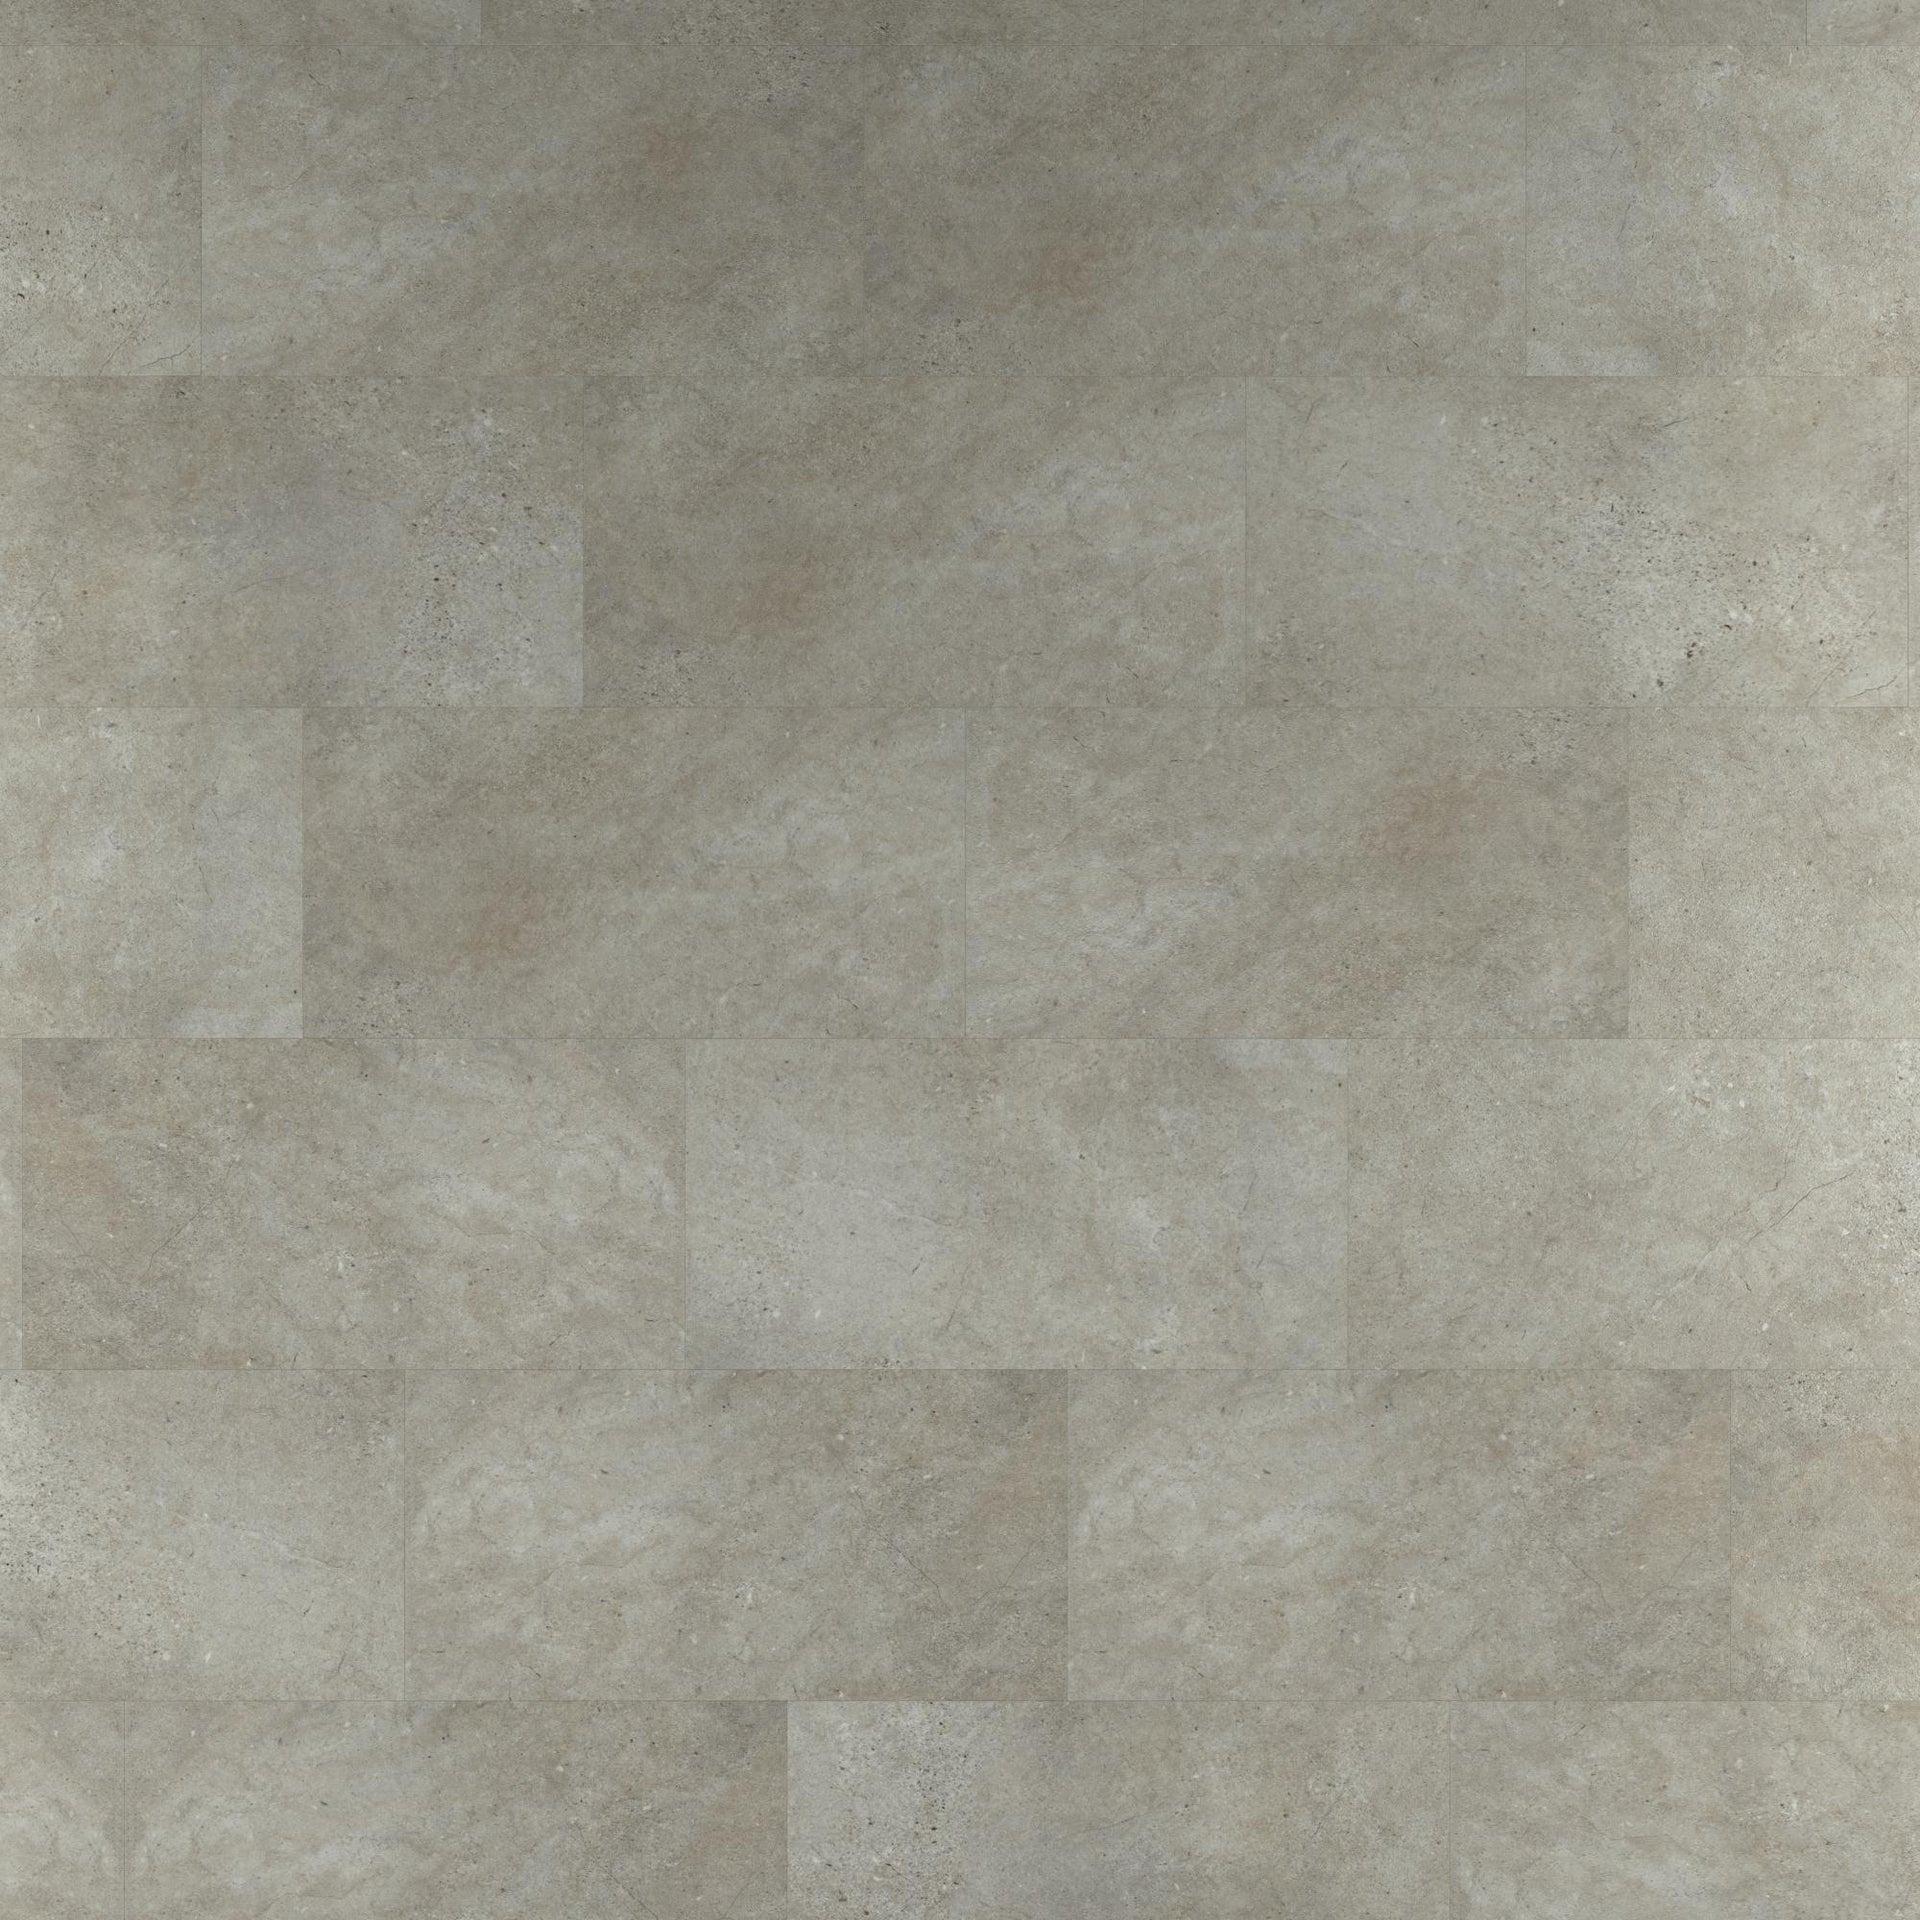 Pavimento PVC flottante clic+ Jaraoso Sp 4.2 mm beige - 3